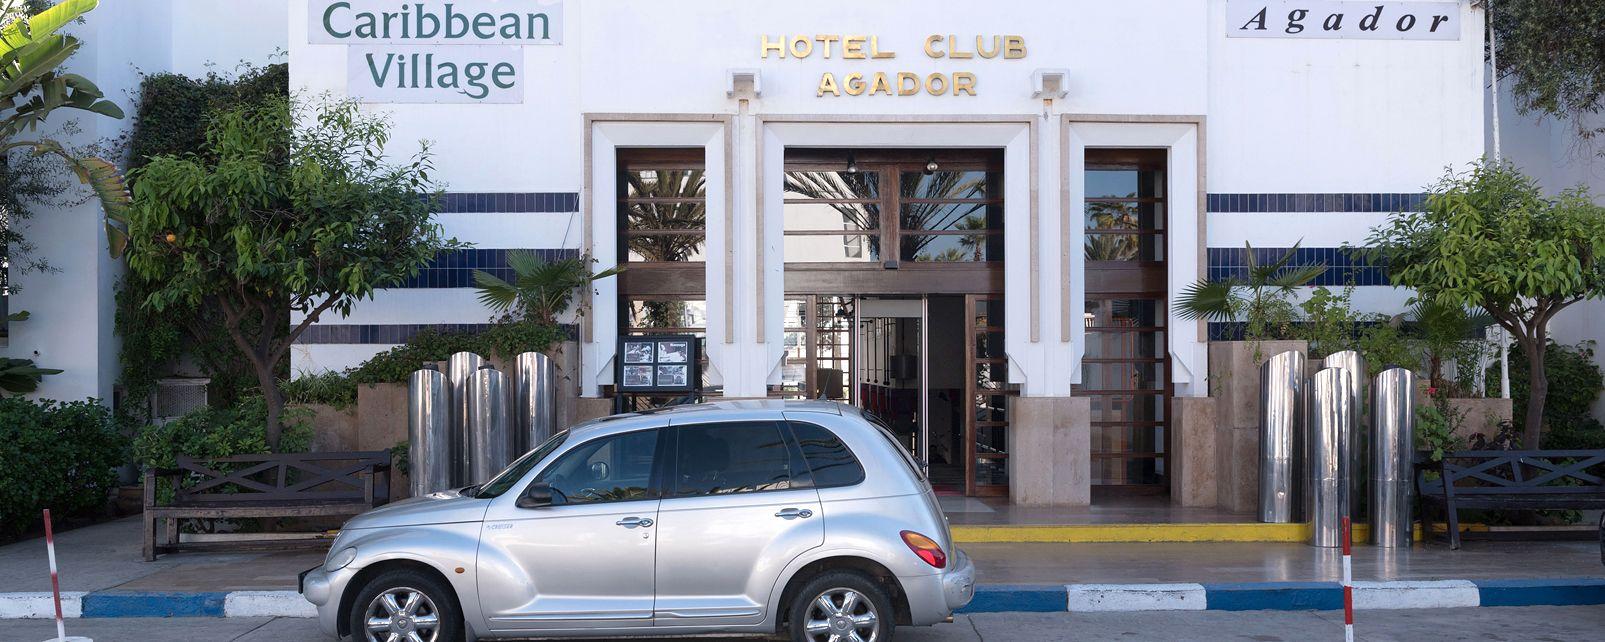 Hôtel Caribbean Village Agador